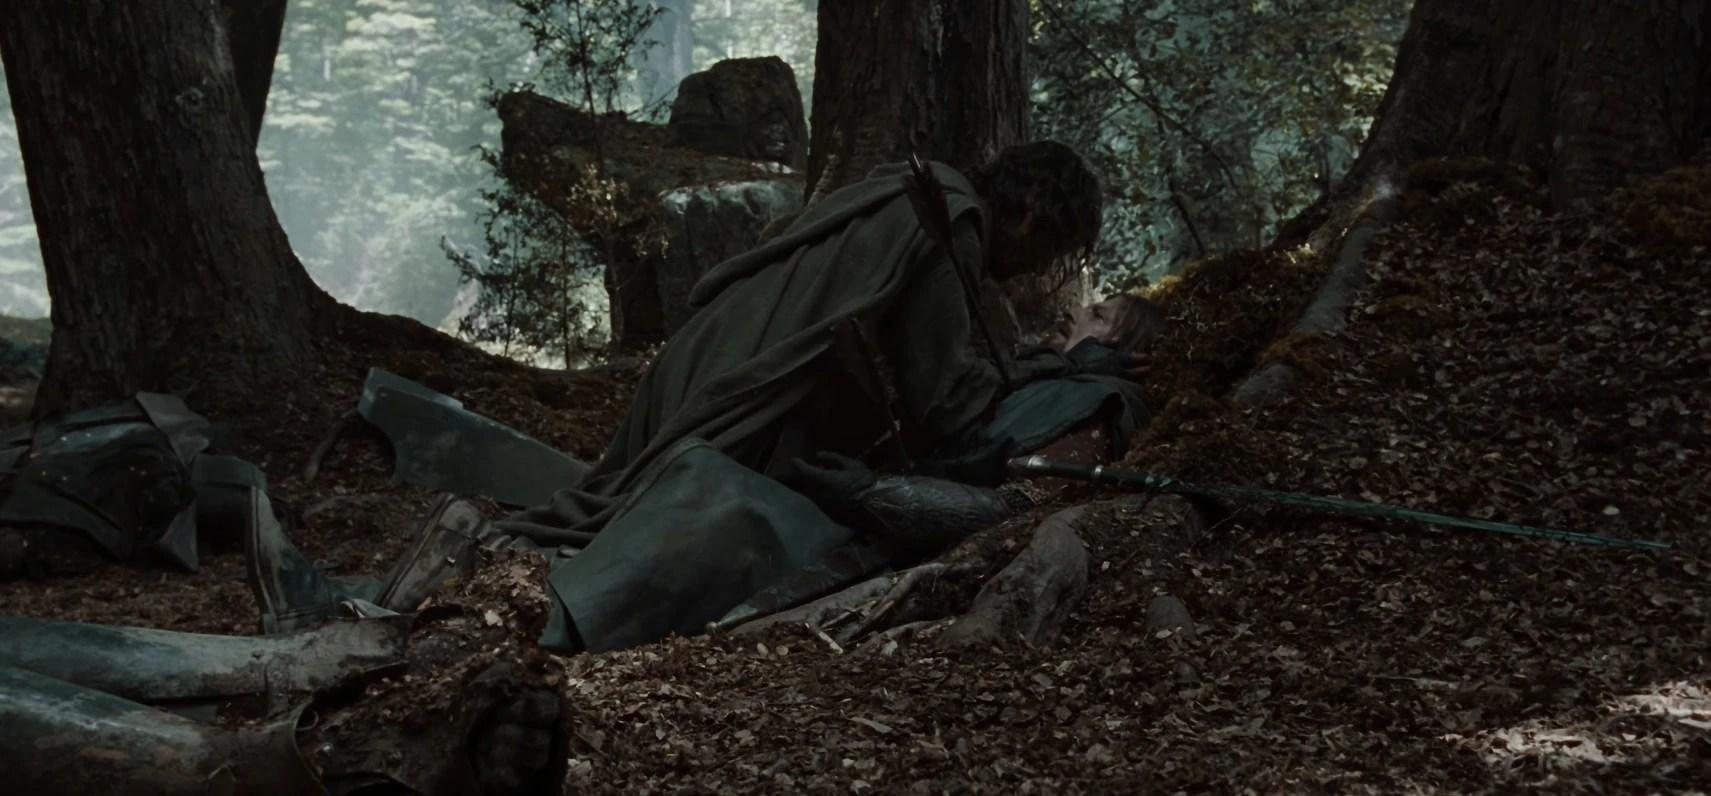 Lotr Falls Of Rauros Wallpaper Aragorn Ii Elessar Lord Of The Rings Wiki